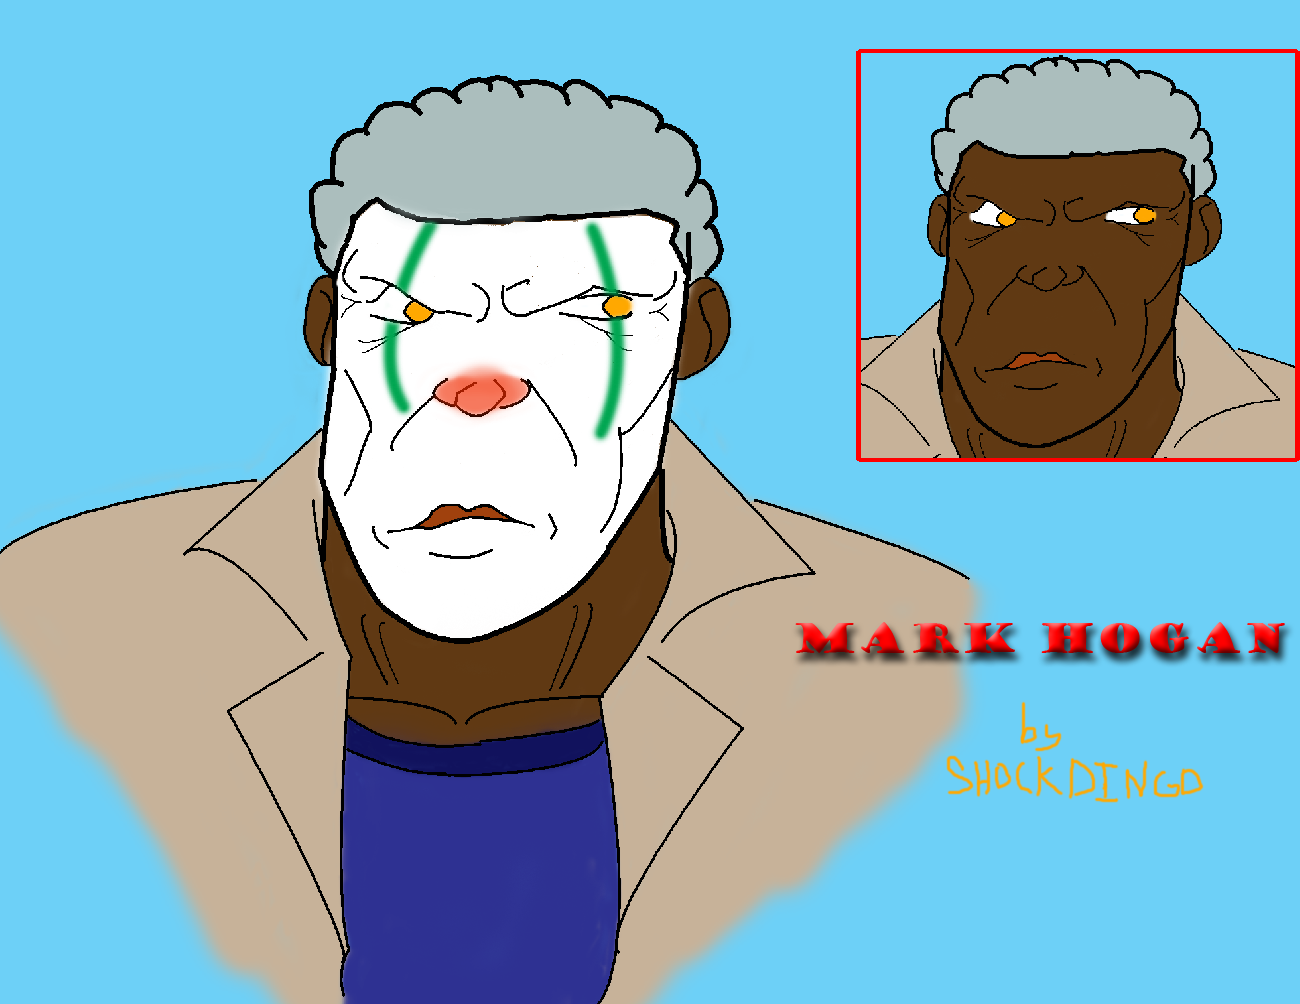 Mark Hogan